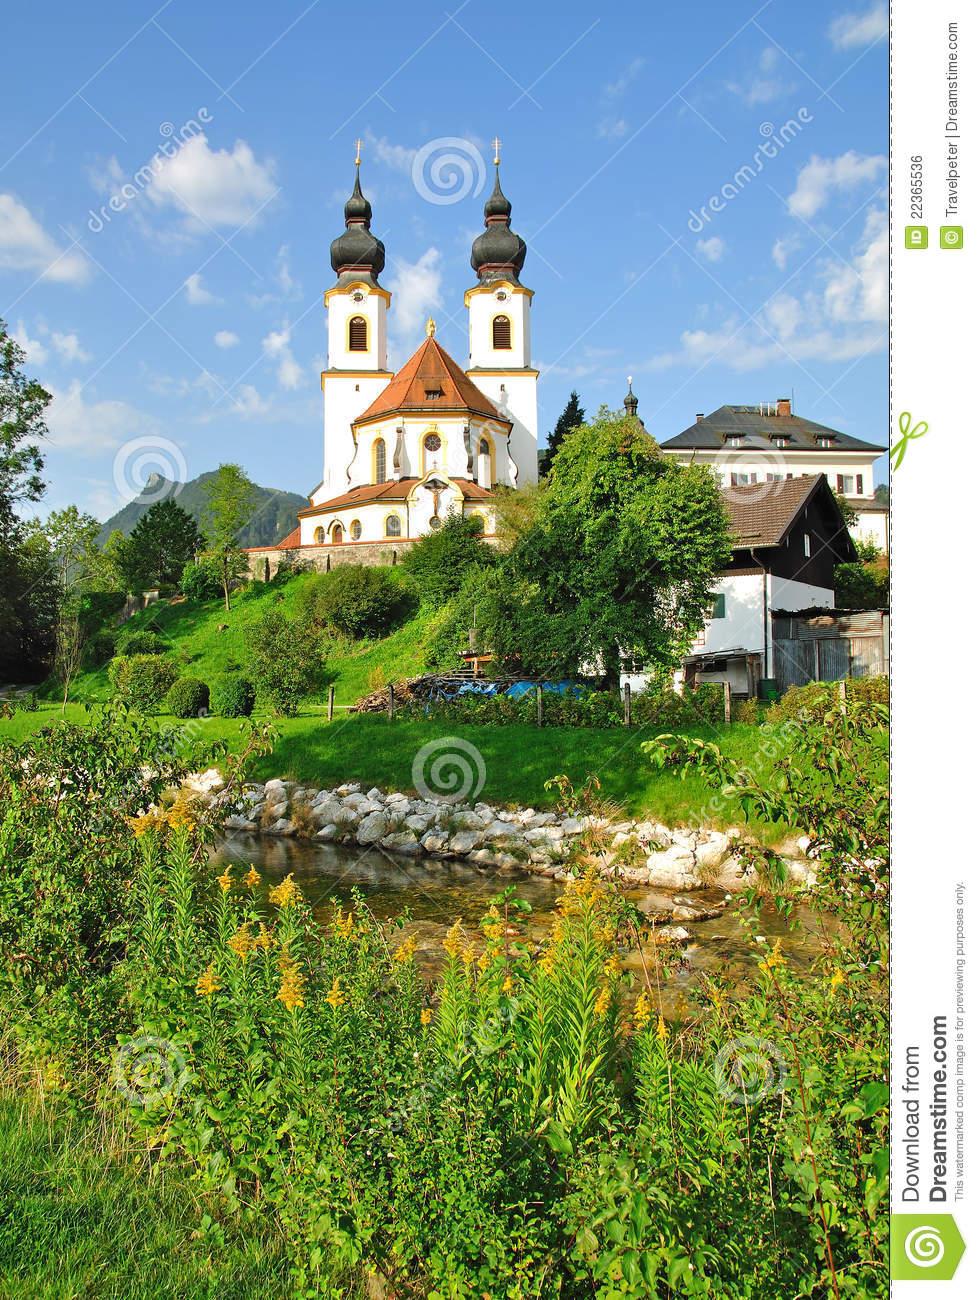 Aschau,Bavaria Royalty Free Stock Image.